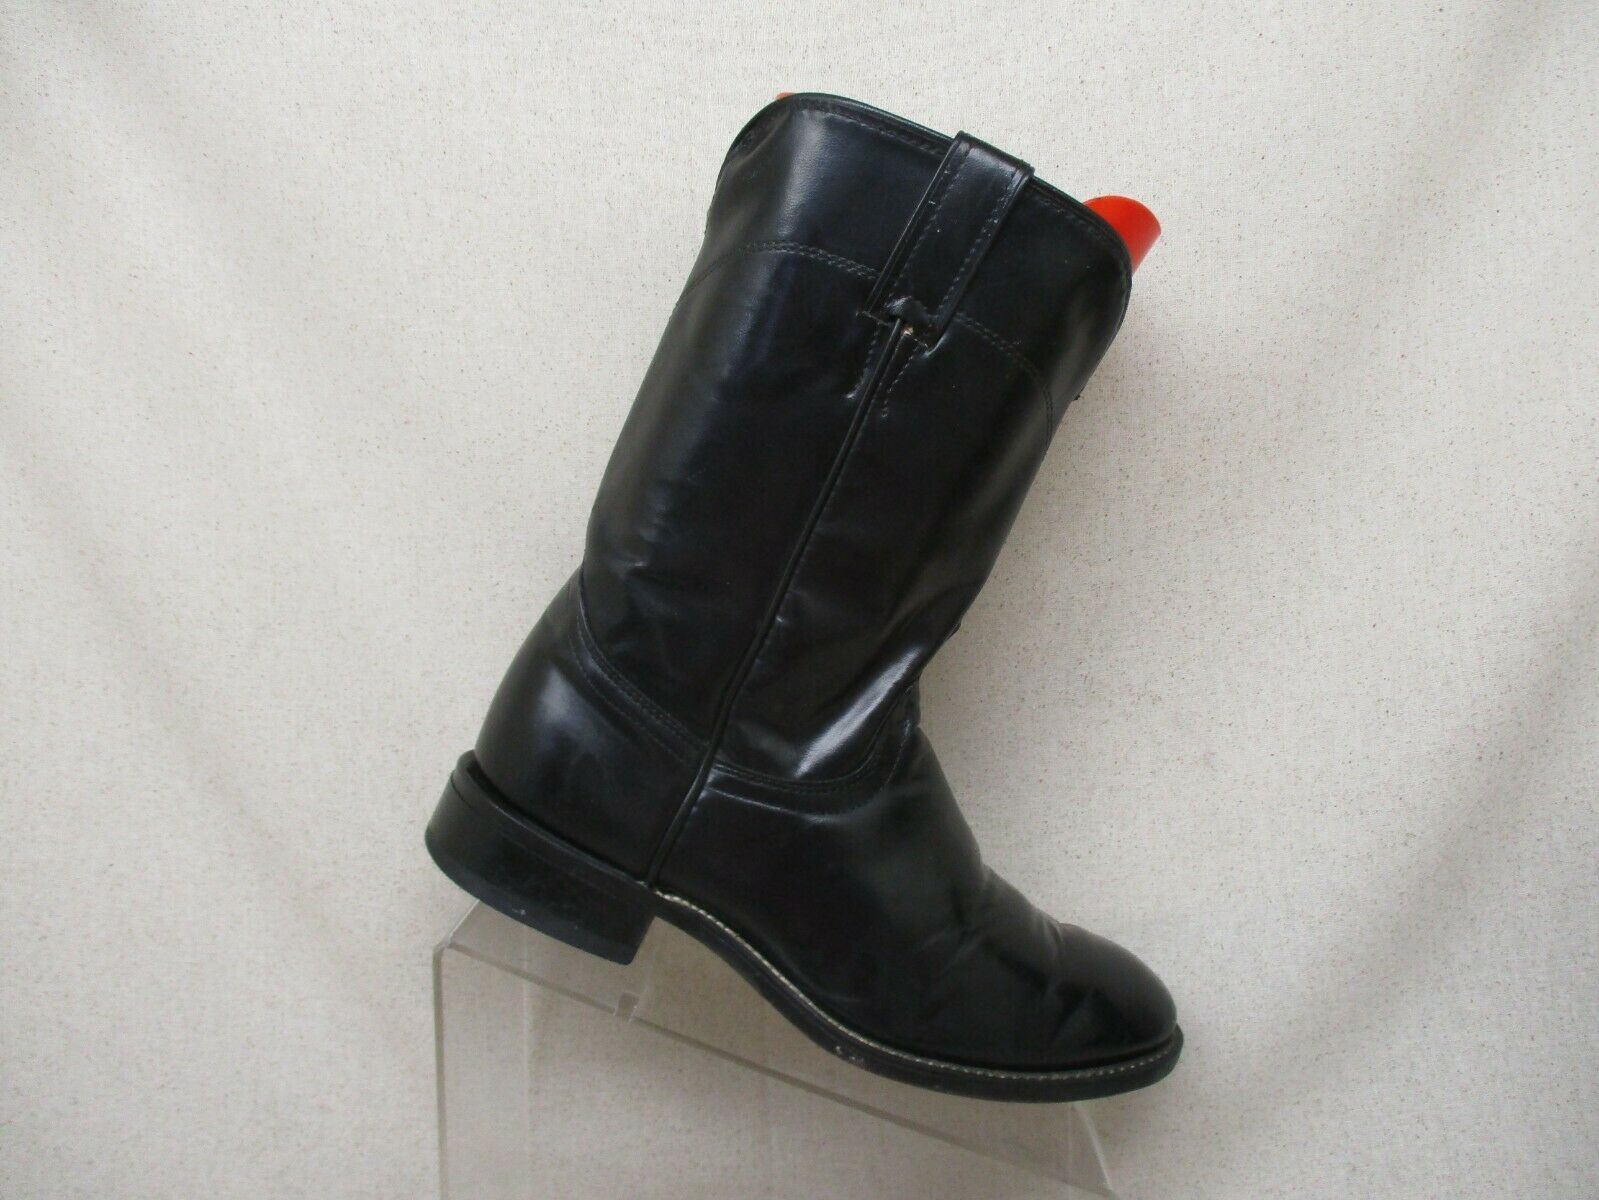 Laredo Black Leather Roper Cowboy Western Boots Mens Size 7.5 EE Style 7902